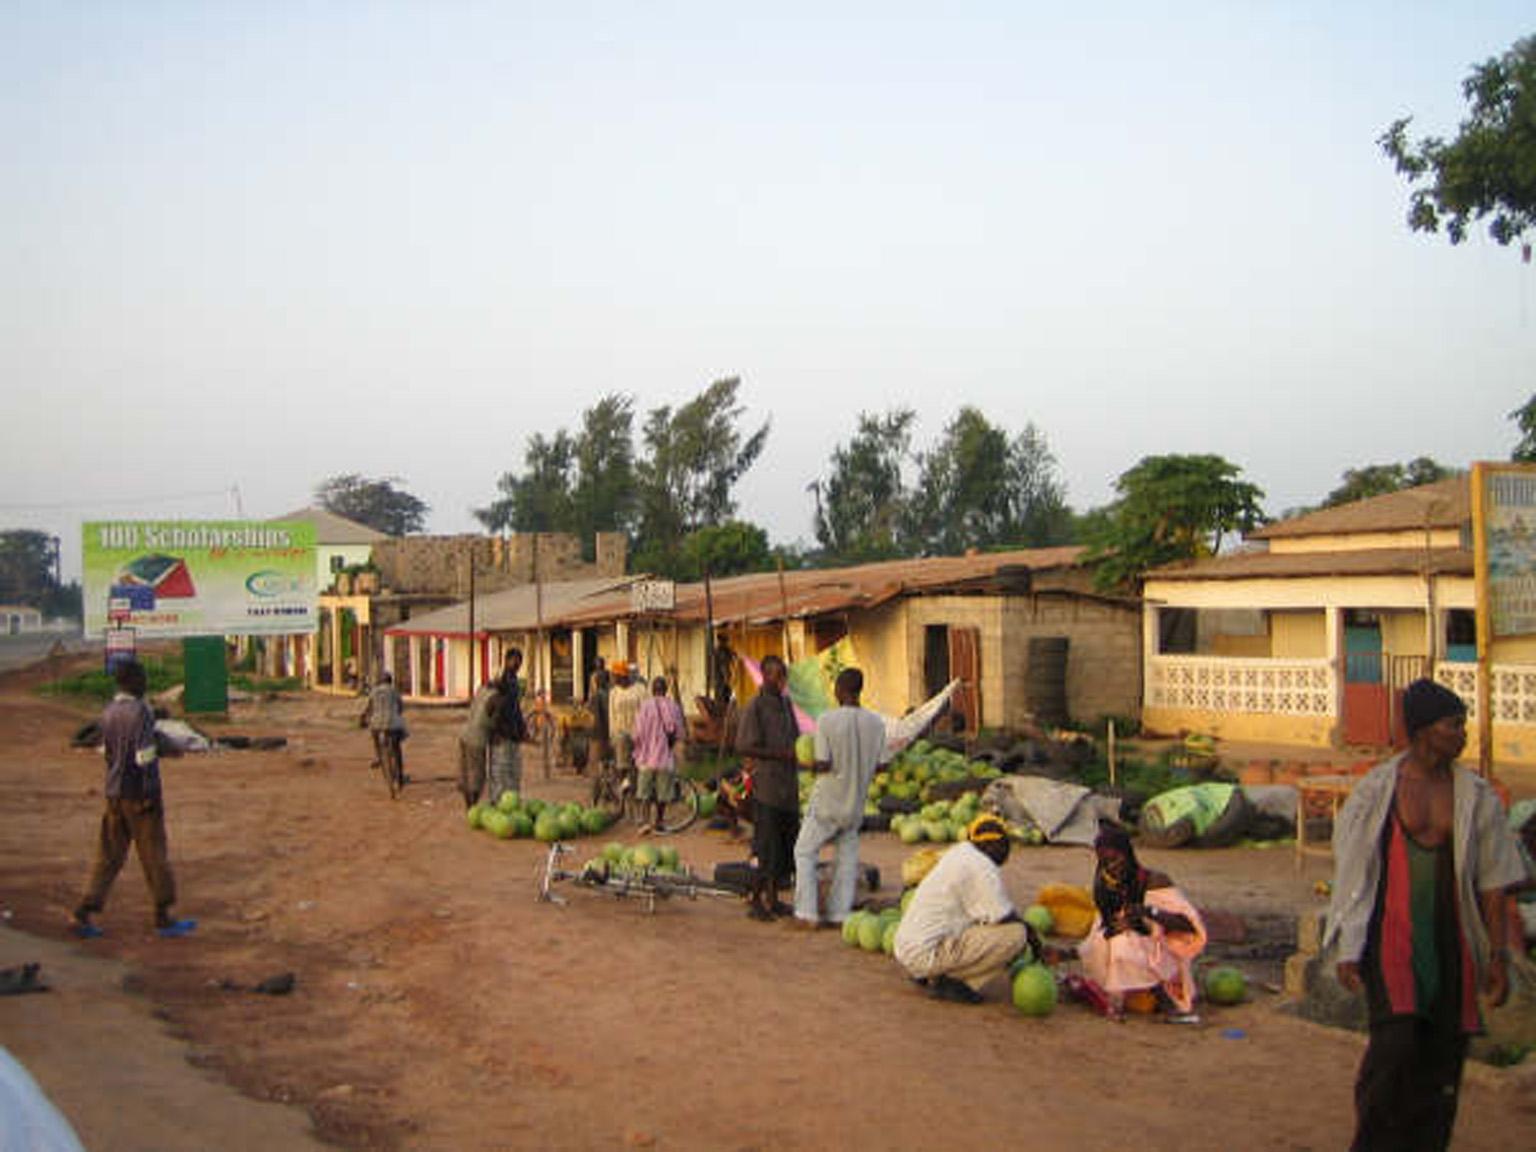 SIERRA LEONA 20